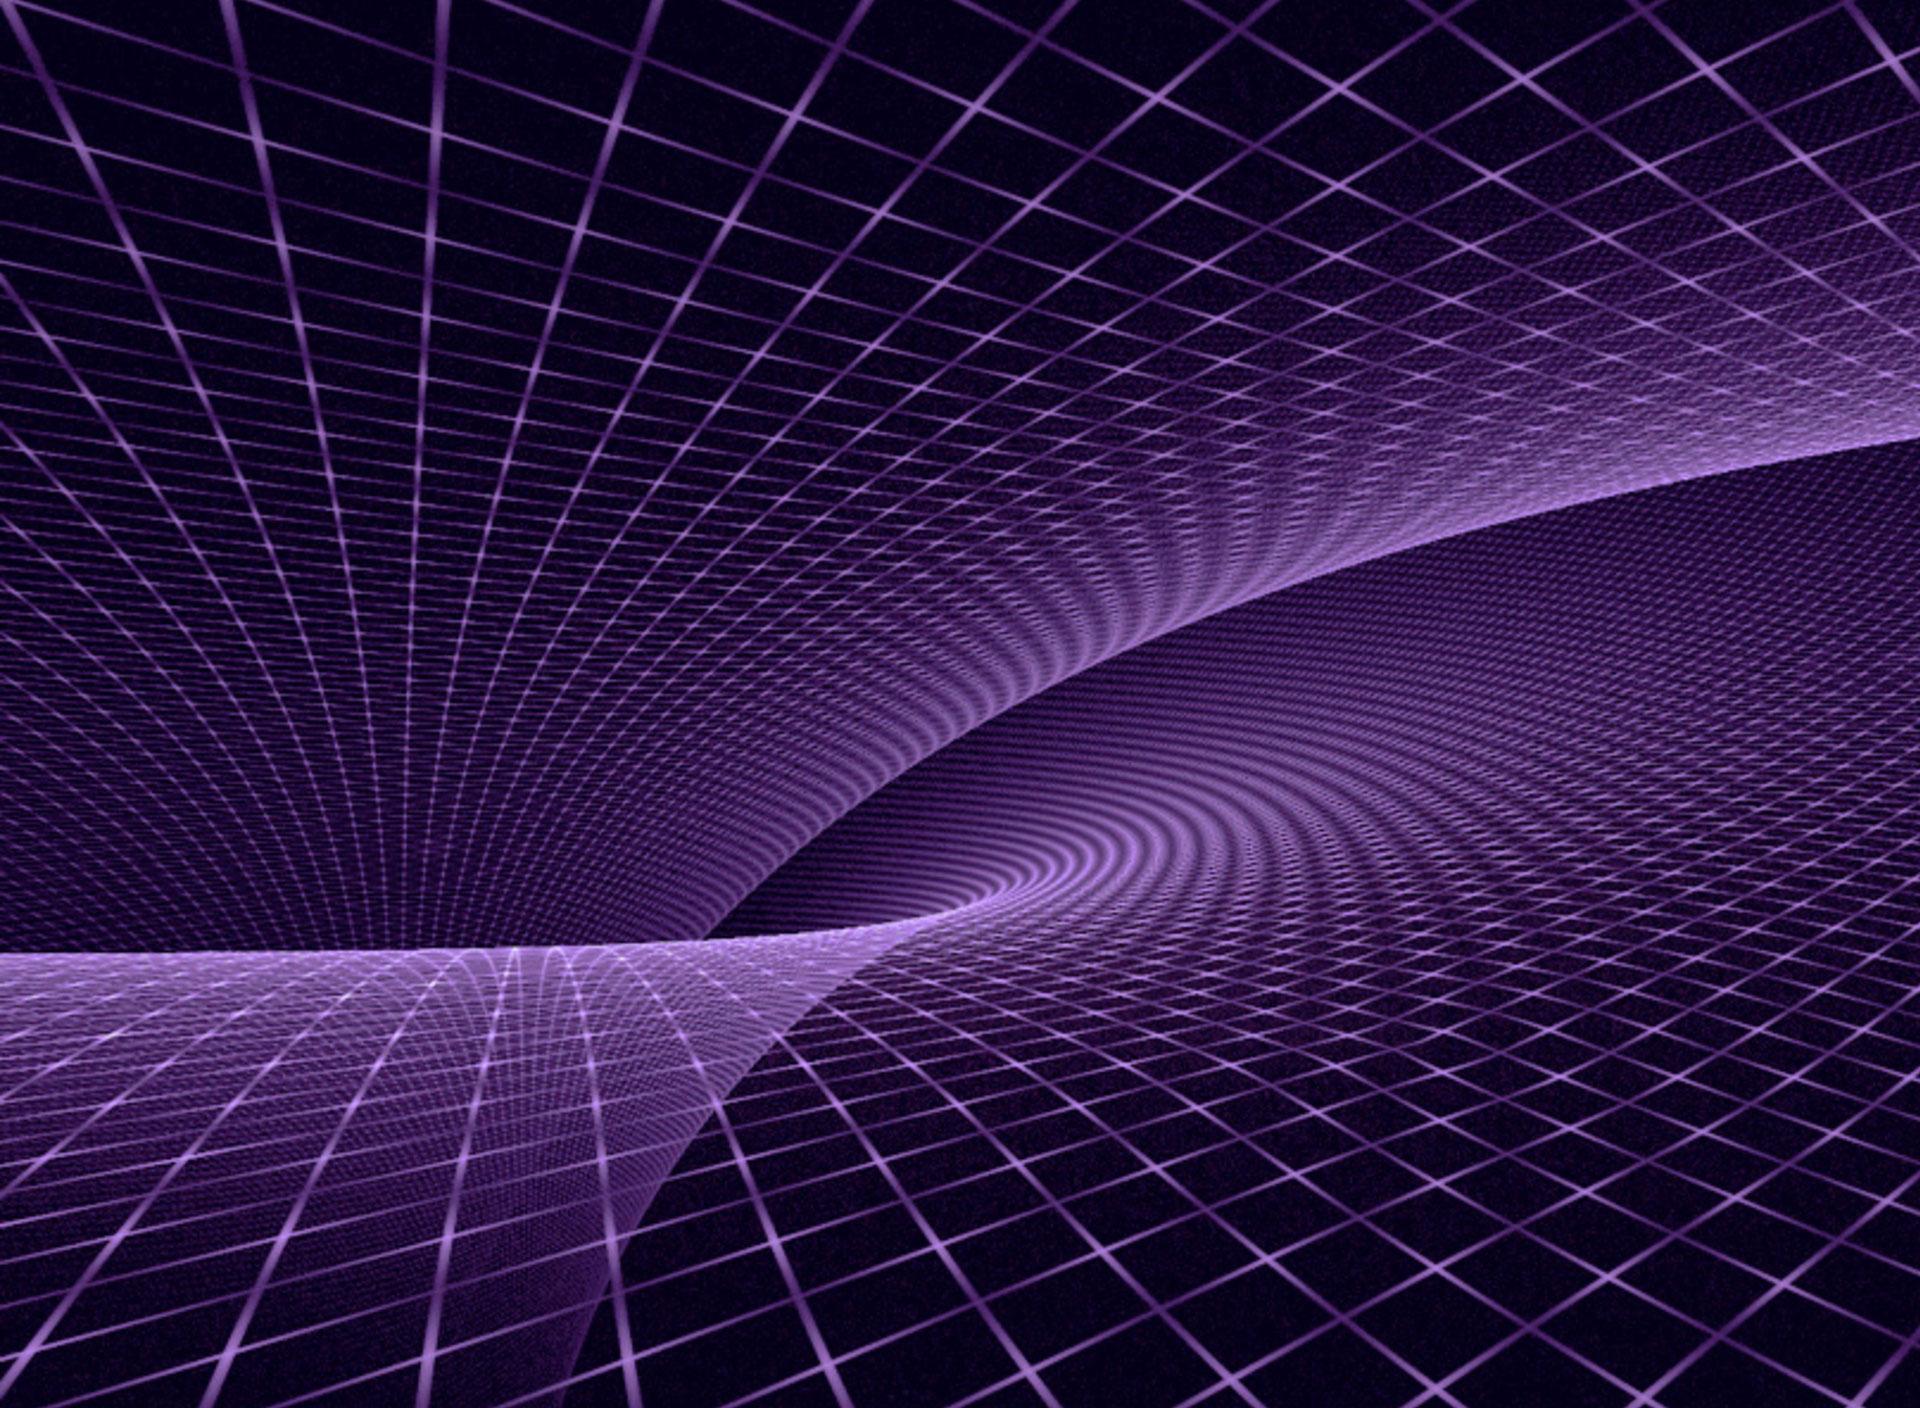 purple fractal 1920x1408 Screensaver wallpaper 1920x1408